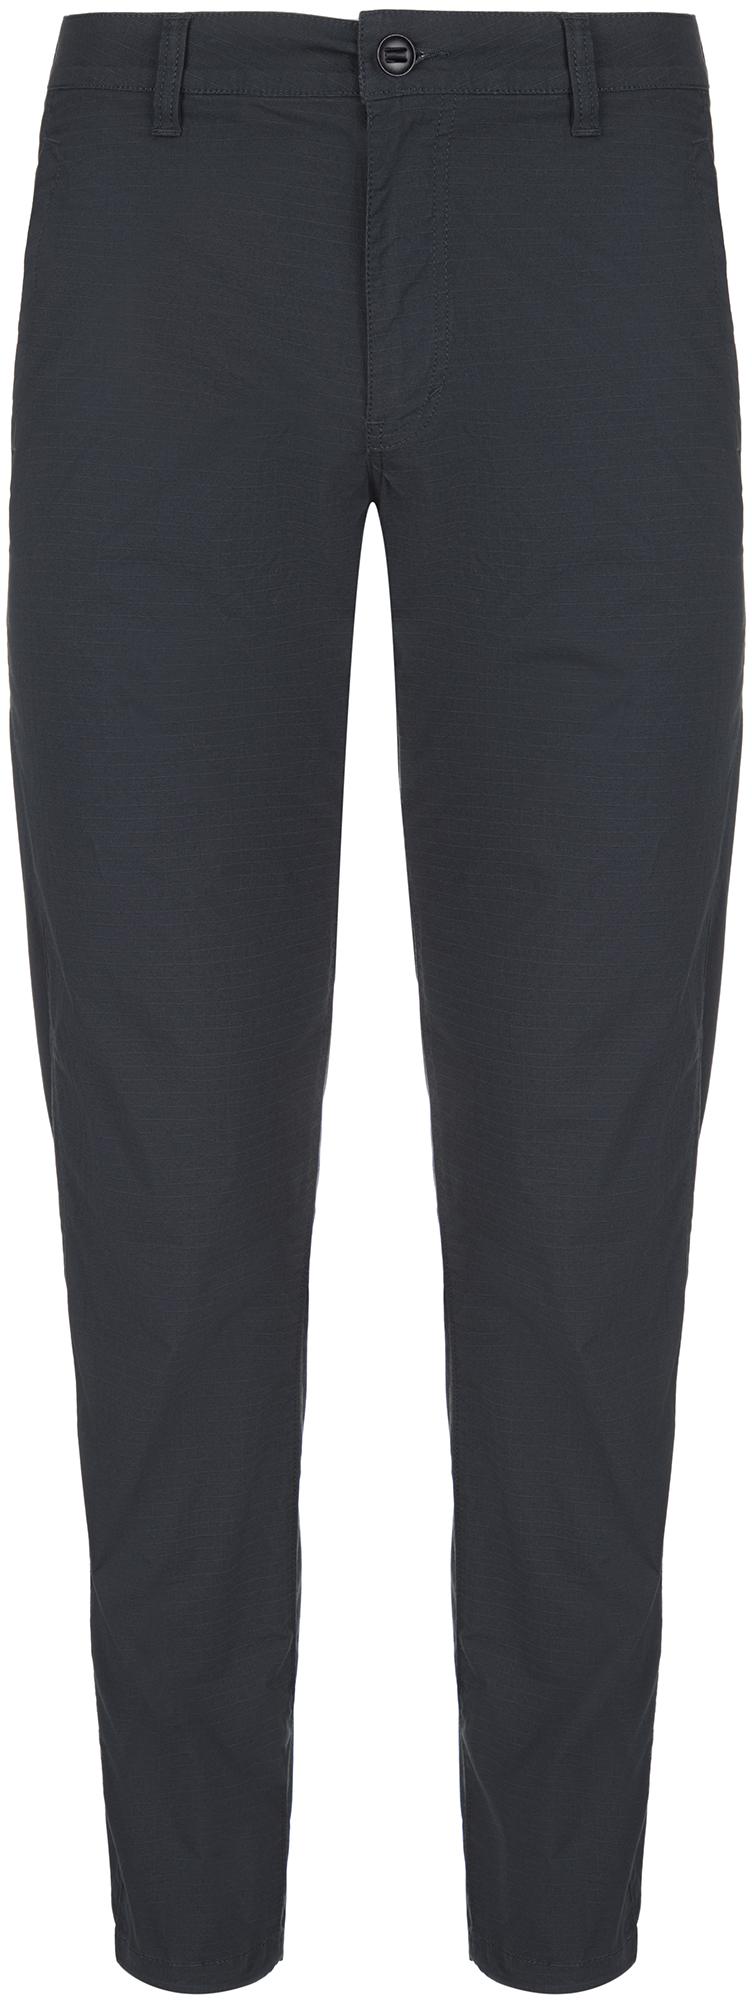 Mountain Hardwear Брюки мужские Mountain Hardwear J Tree™, размер 52